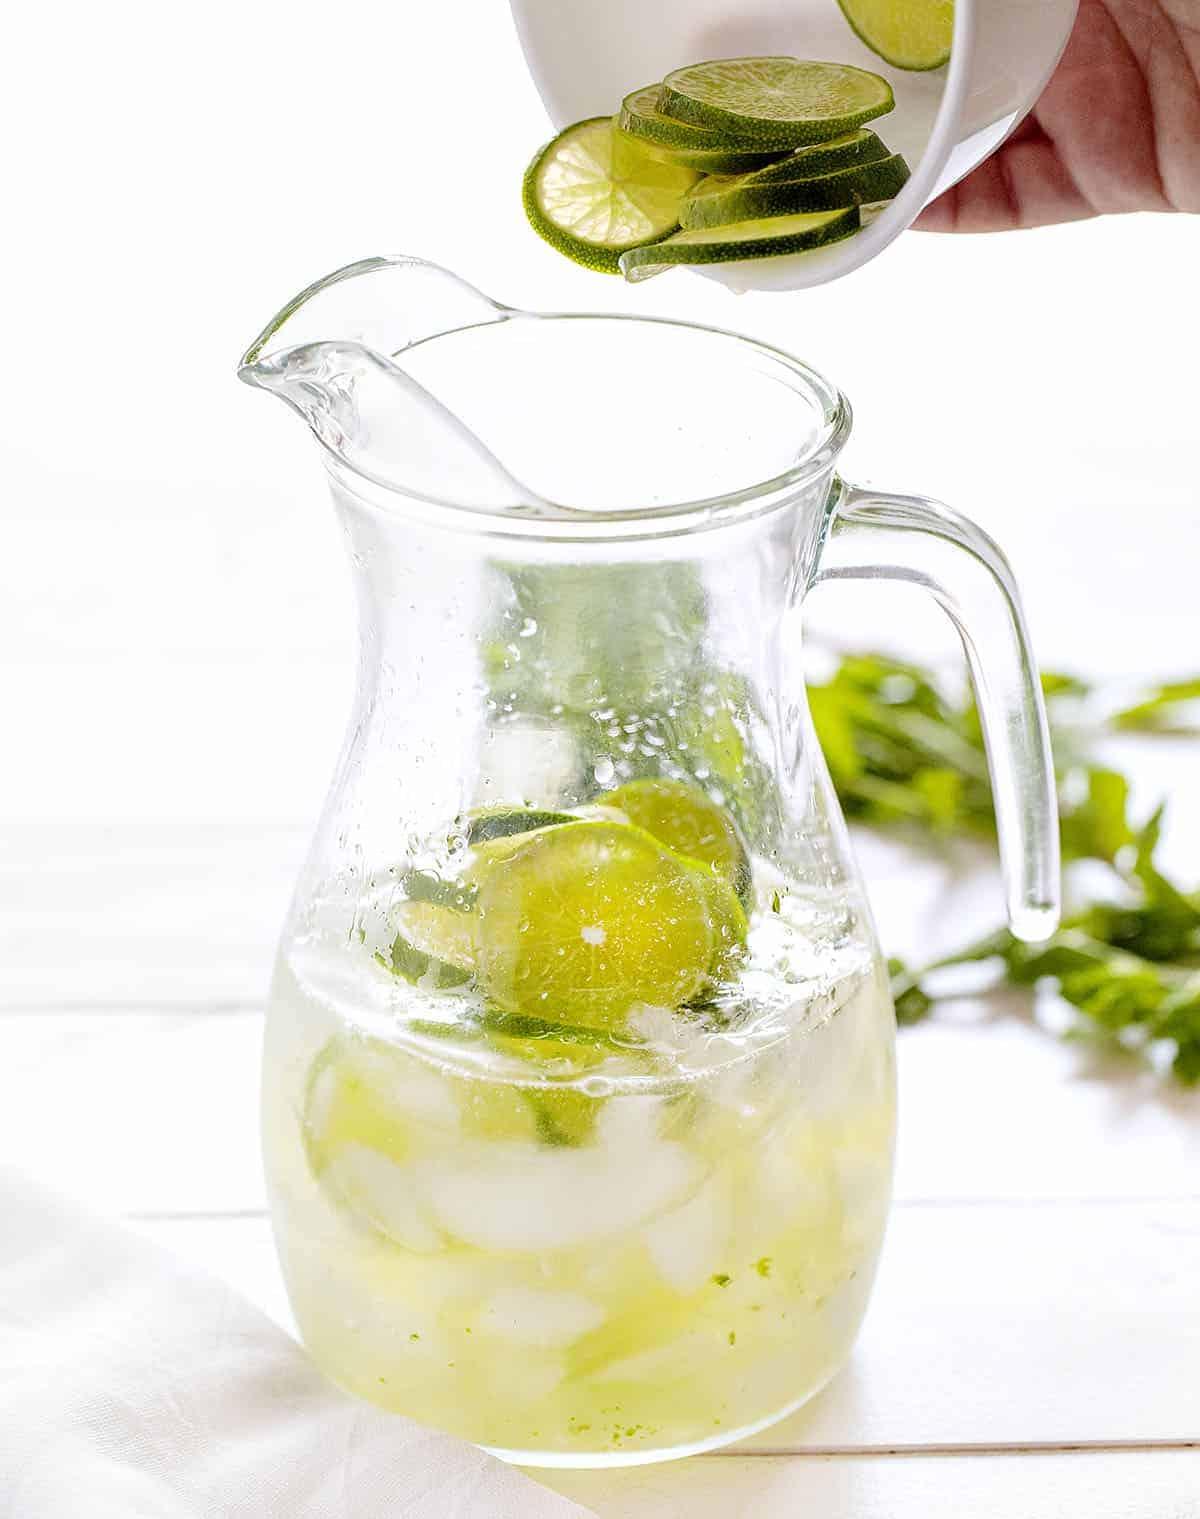 Adding Limes to Mojito Sangria